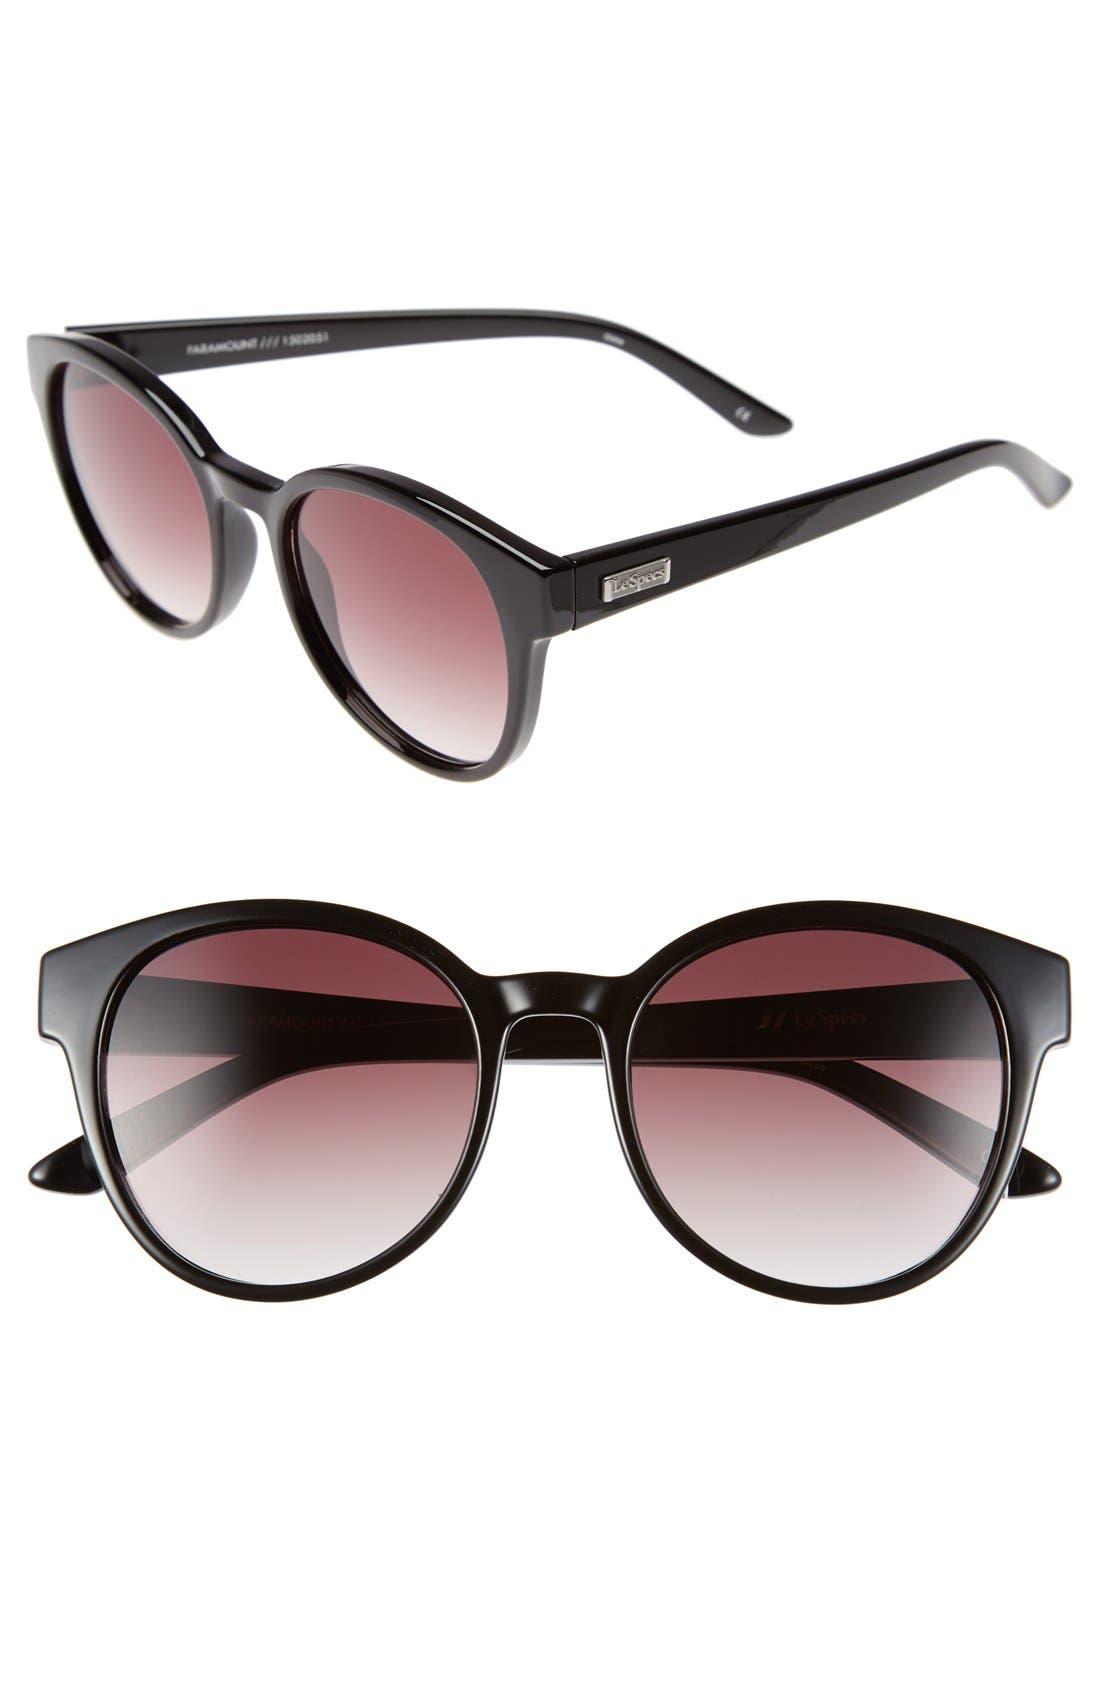 Main Image - Le Specs 'Paramount' 53mm Sunglasses